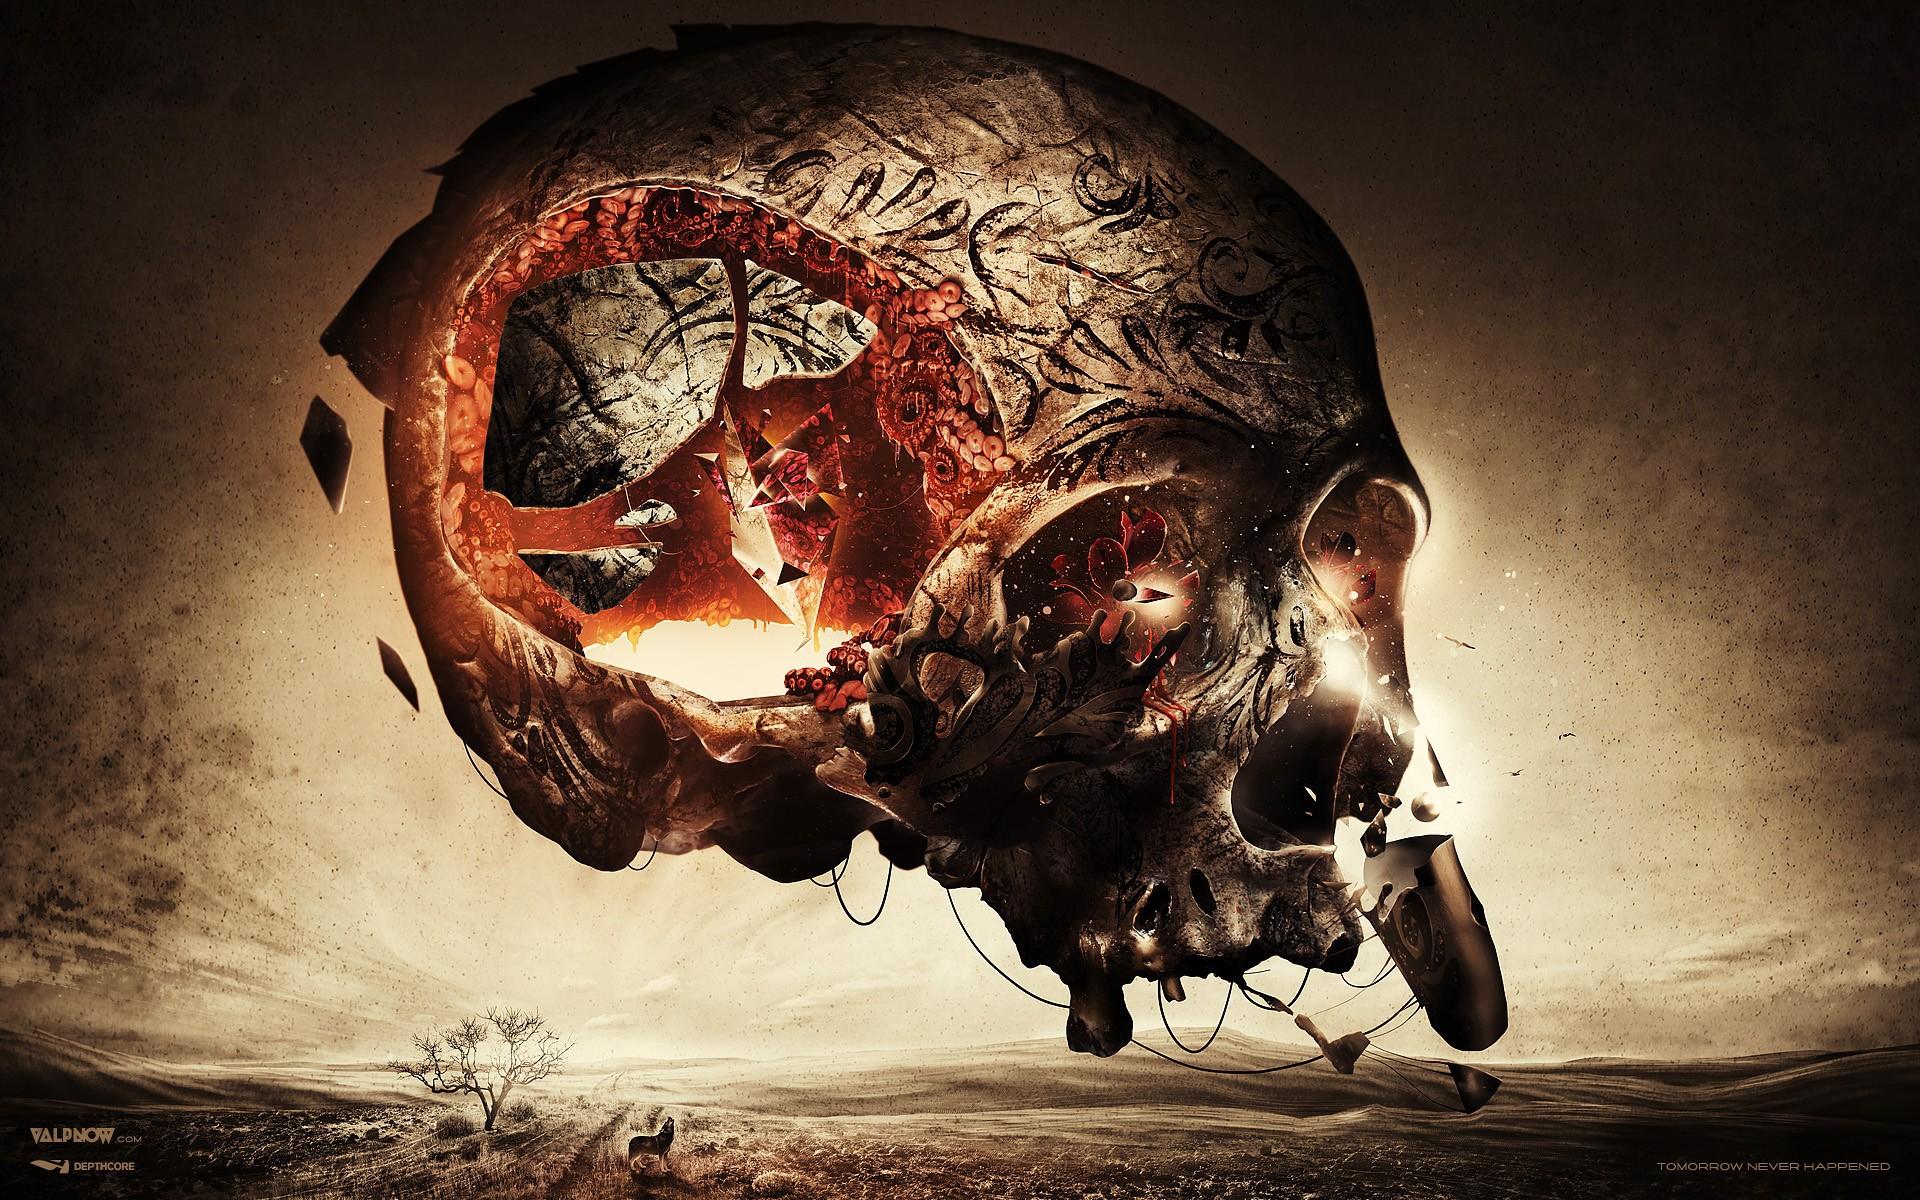 ... Skeleton, Skull, engraving, anarchy, Cyberpunk - 1920x1200